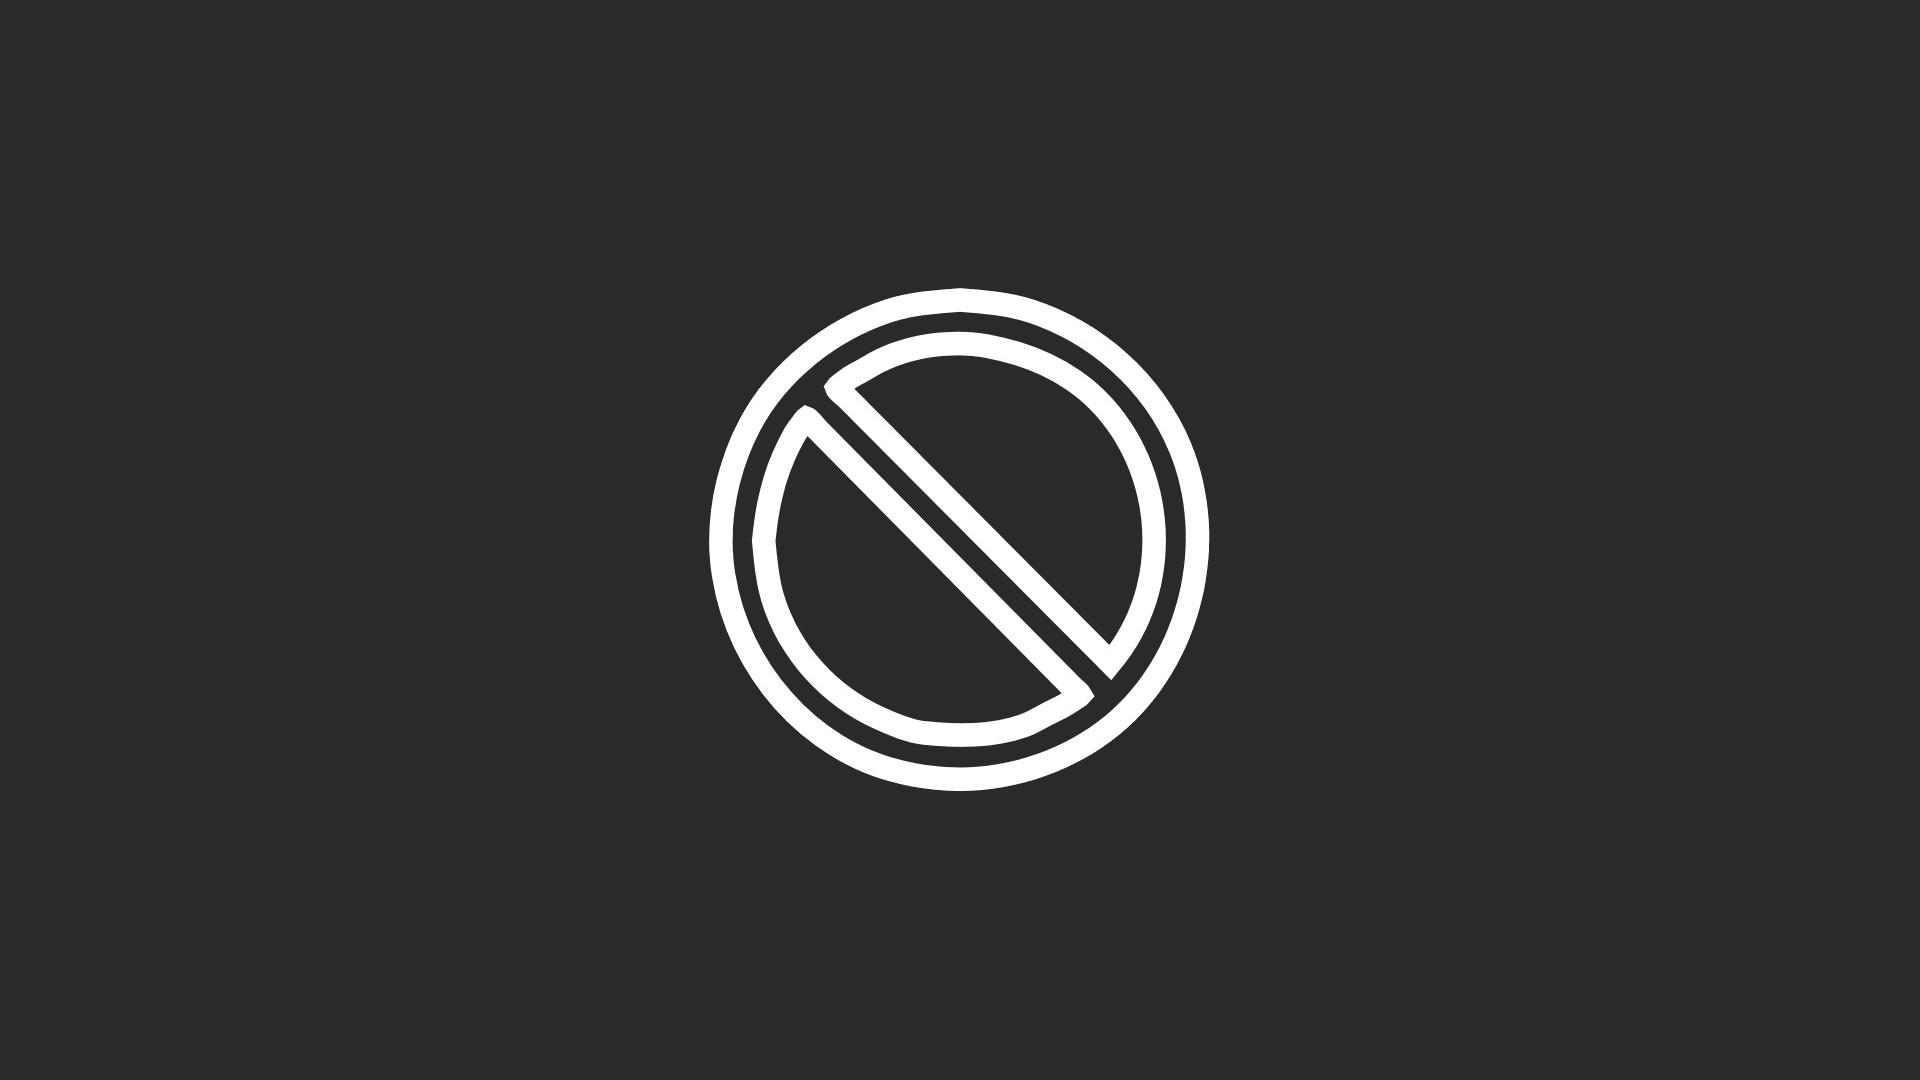 EU-Urheberrecht sieht Upload-Filter vor